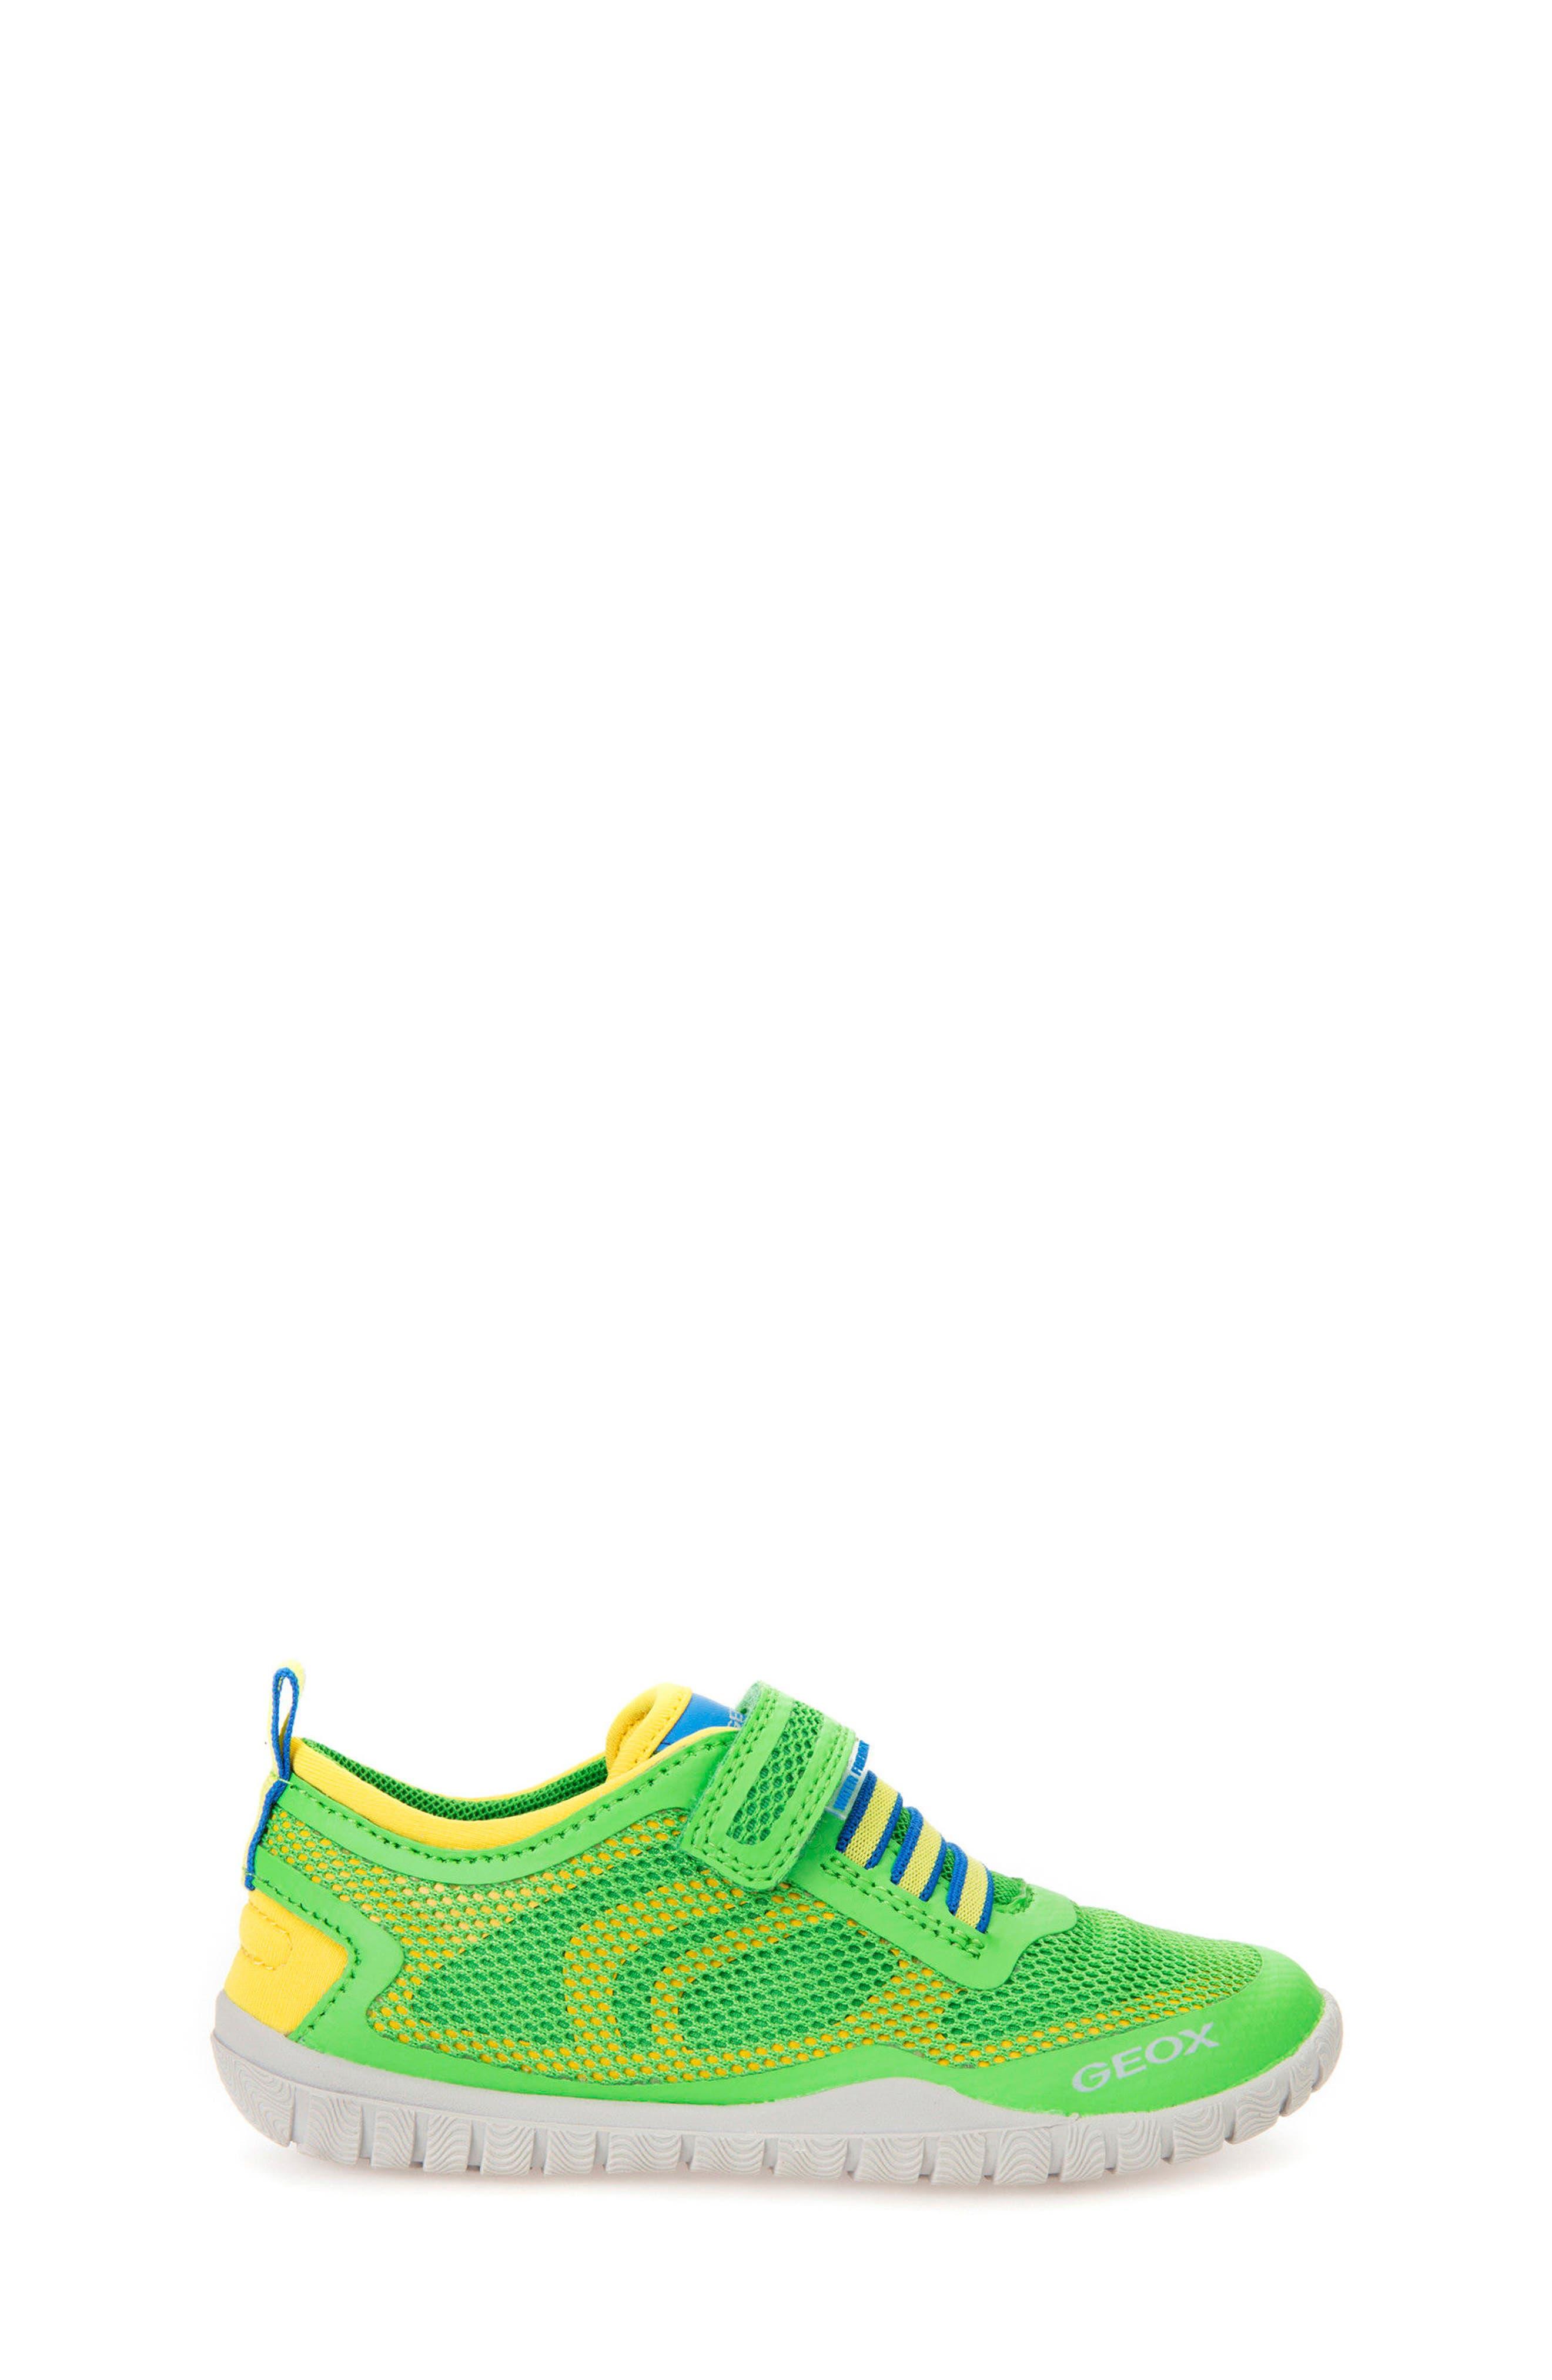 Trifon Sneaker,                             Alternate thumbnail 3, color,                             GREEN/ YELLOW